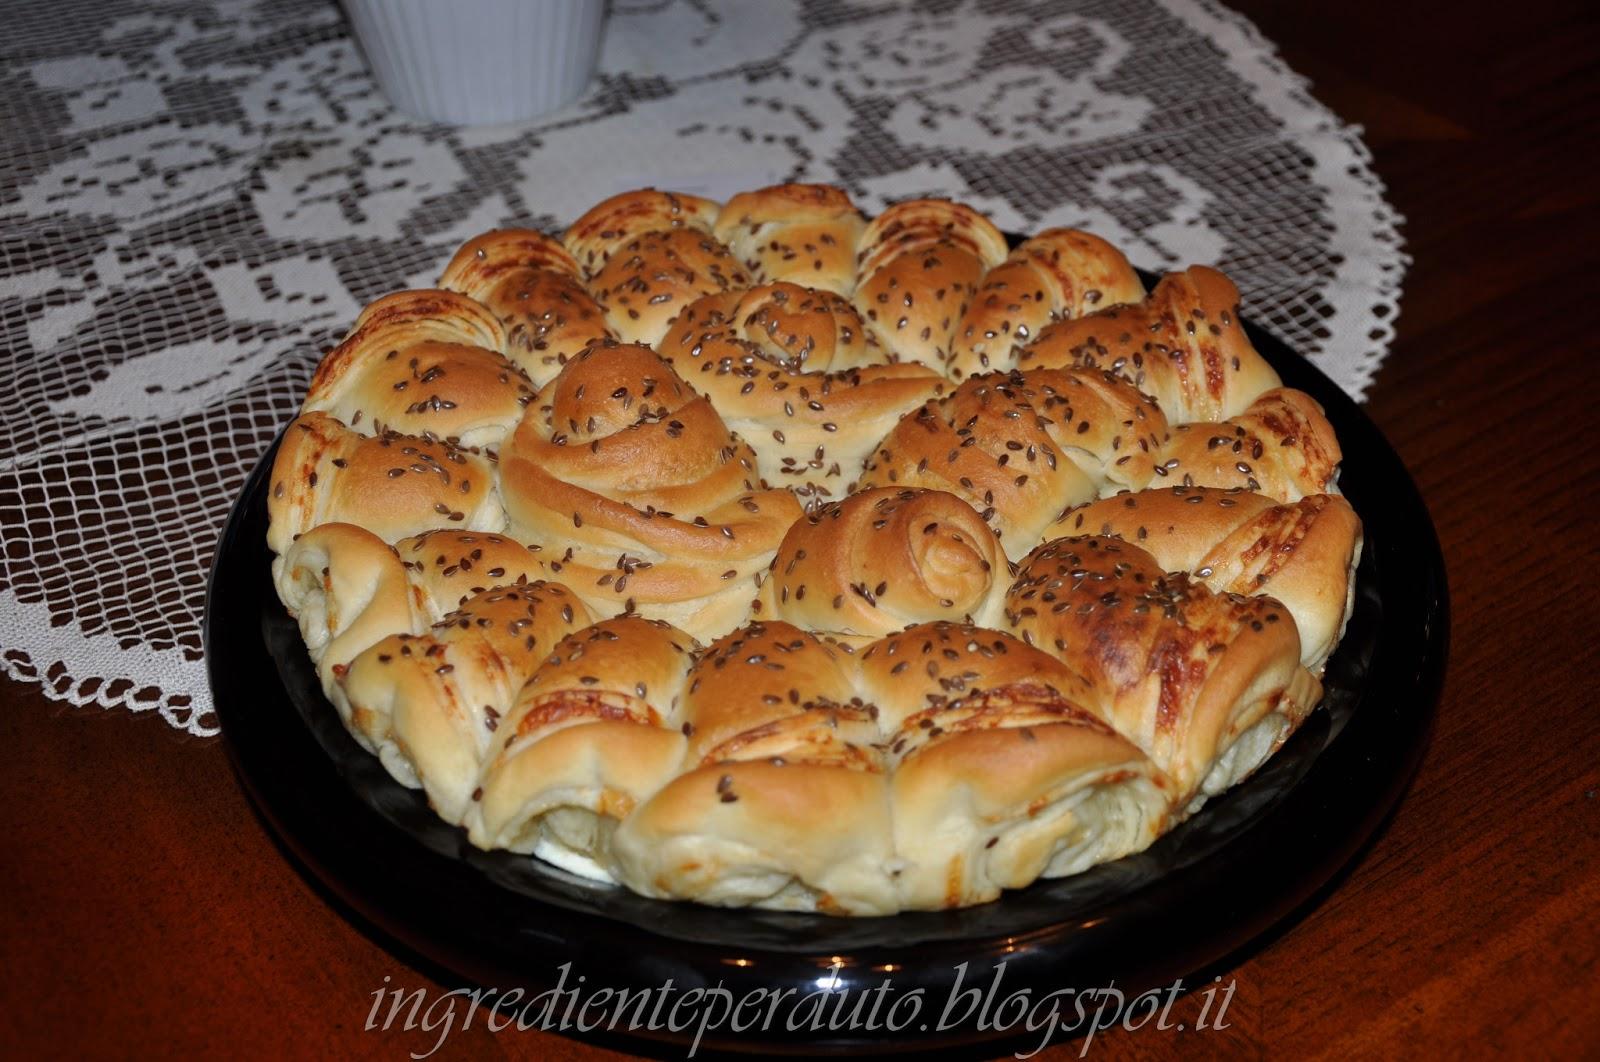 L 39 ingrediente perduto pane turco allo yogurt o katmer - Come si fa il bagno turco ...